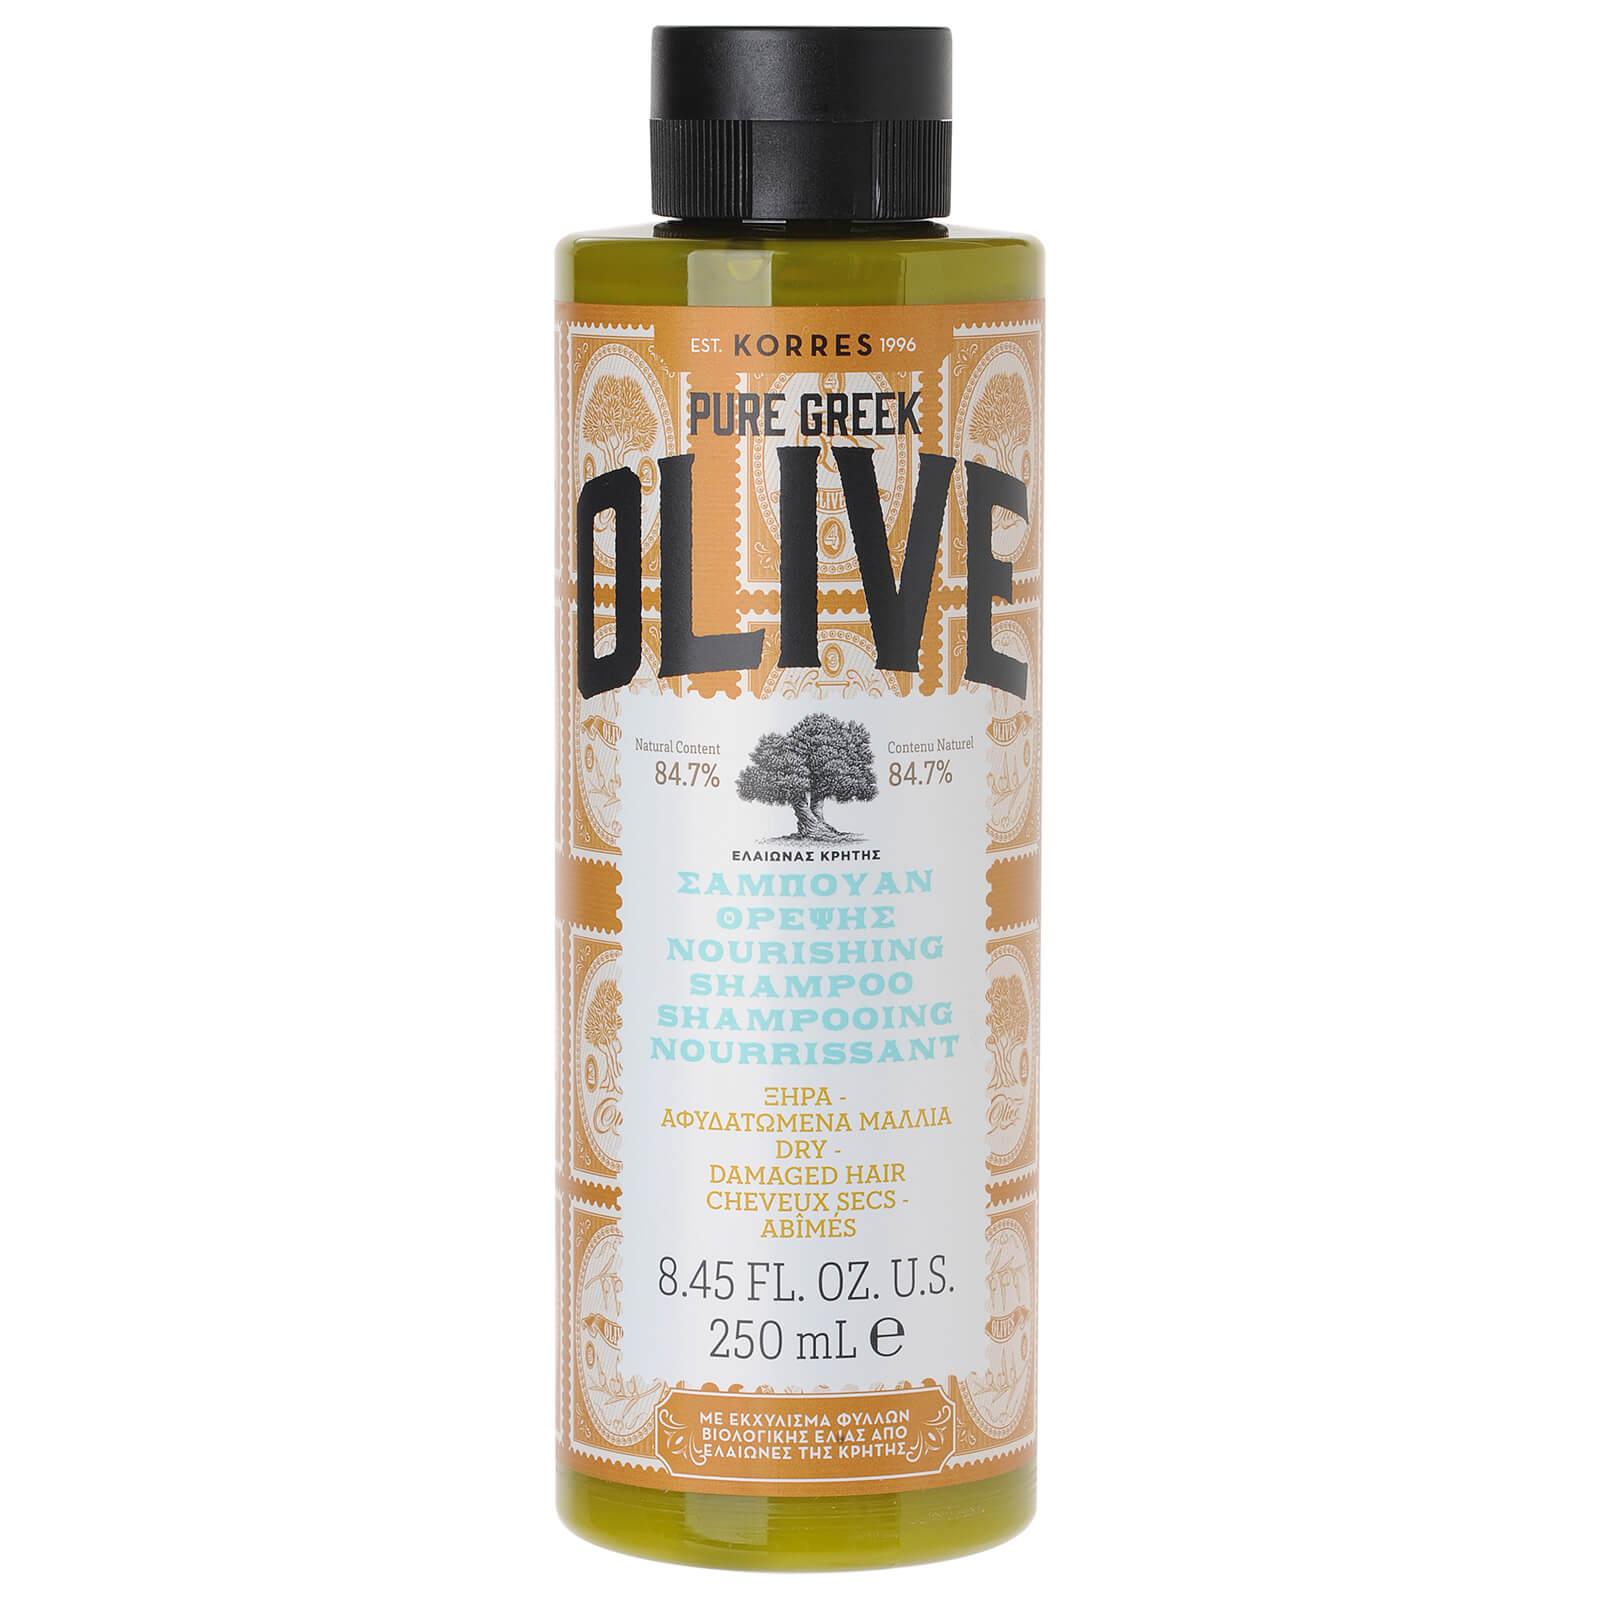 KORRES Shampooing Nourrissant Cheveux secs/abîmés Pure Greek Olive KORRES 250ml